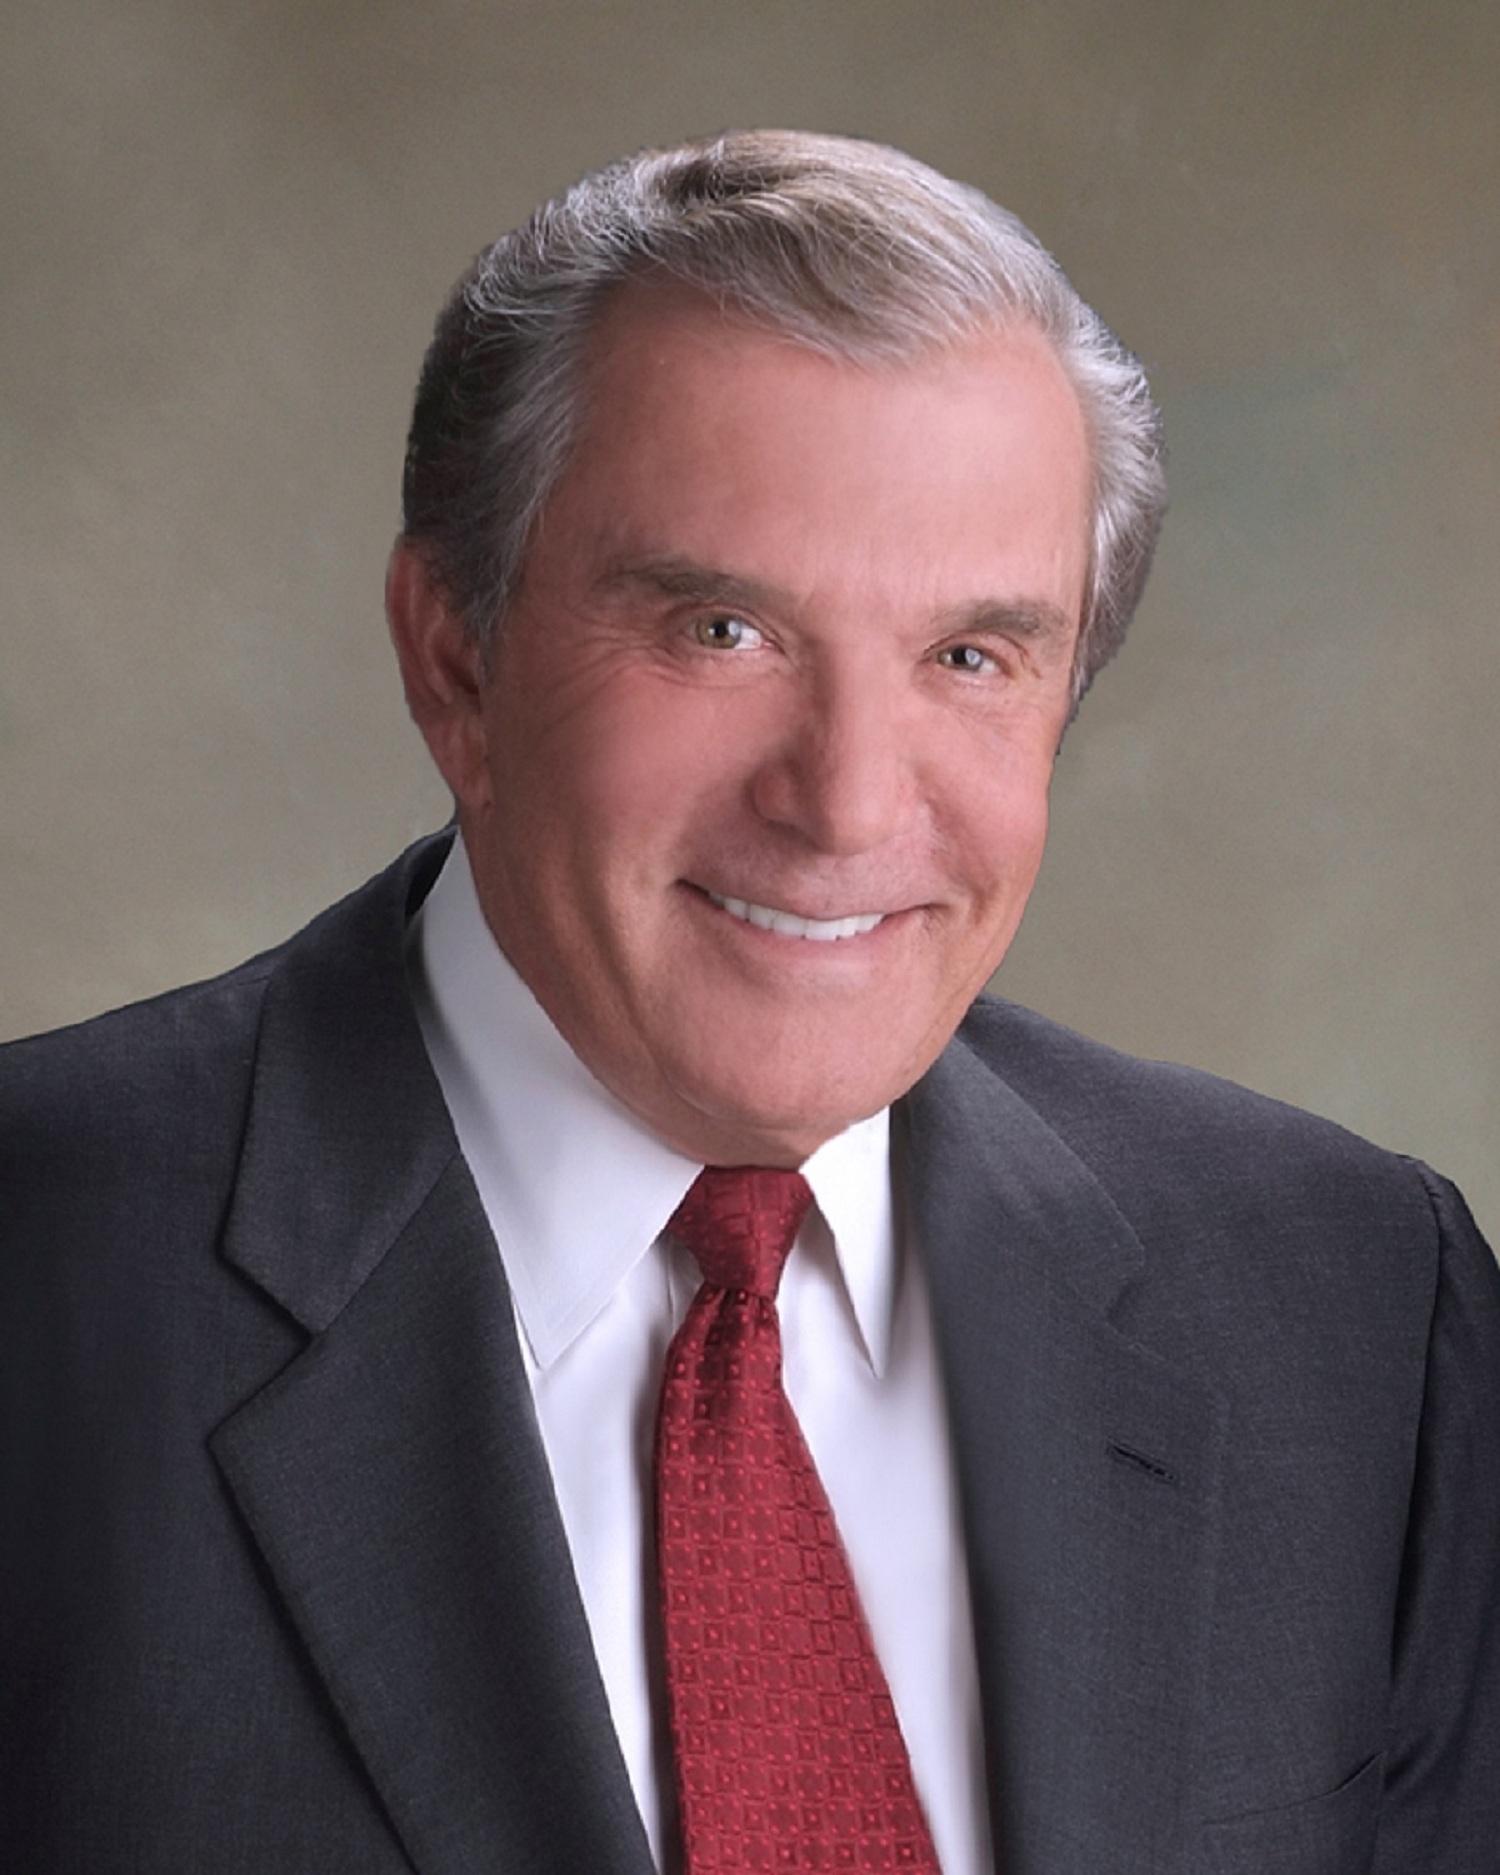 Greg Mosher (Photo: Business Wire)